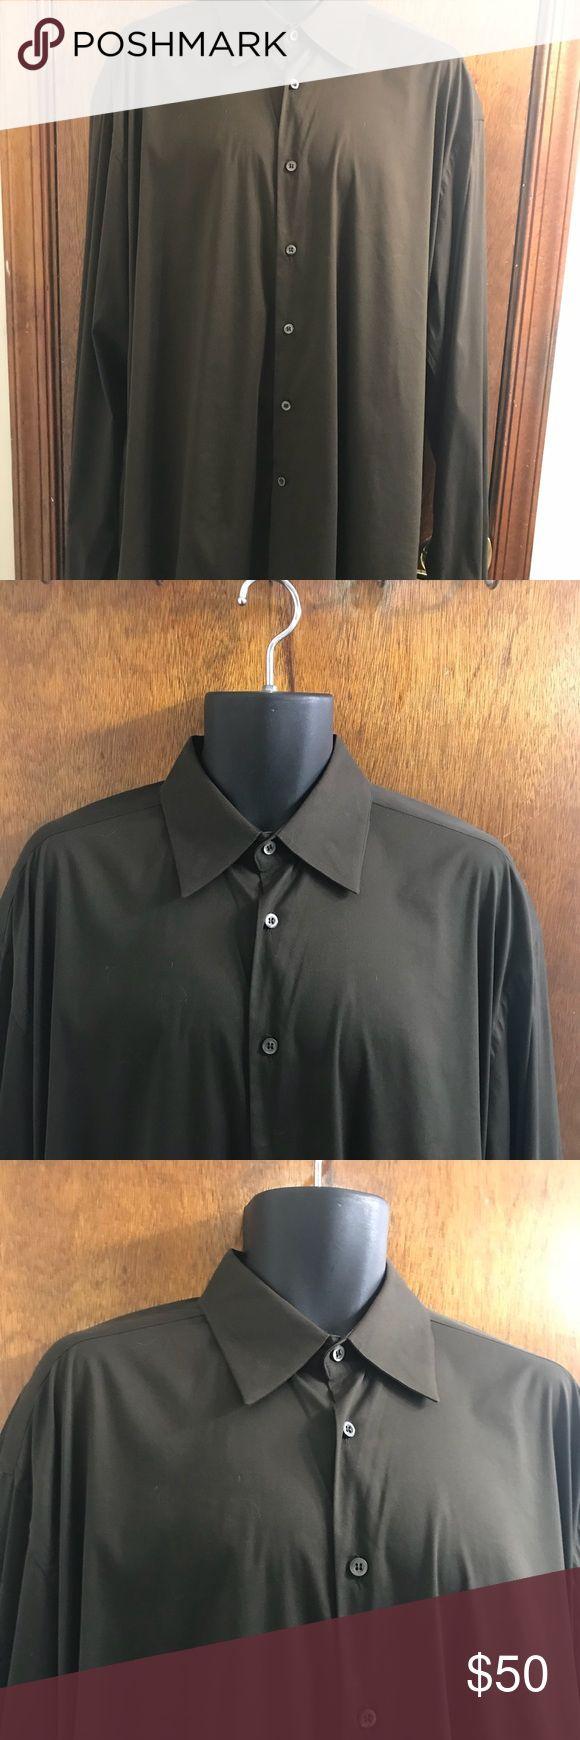 "Prada Men's Brown Dress Shirt Size 43/17 43 17 Prada Men's Brown Dress Shirt Size 43/17 43 17 Dry Cleaned! Cotton blend  Been dry cleaned  Pit to pit 26.5"" Sleeves 27.5"" Length 34"" Prada Shirts Dress Shirts"